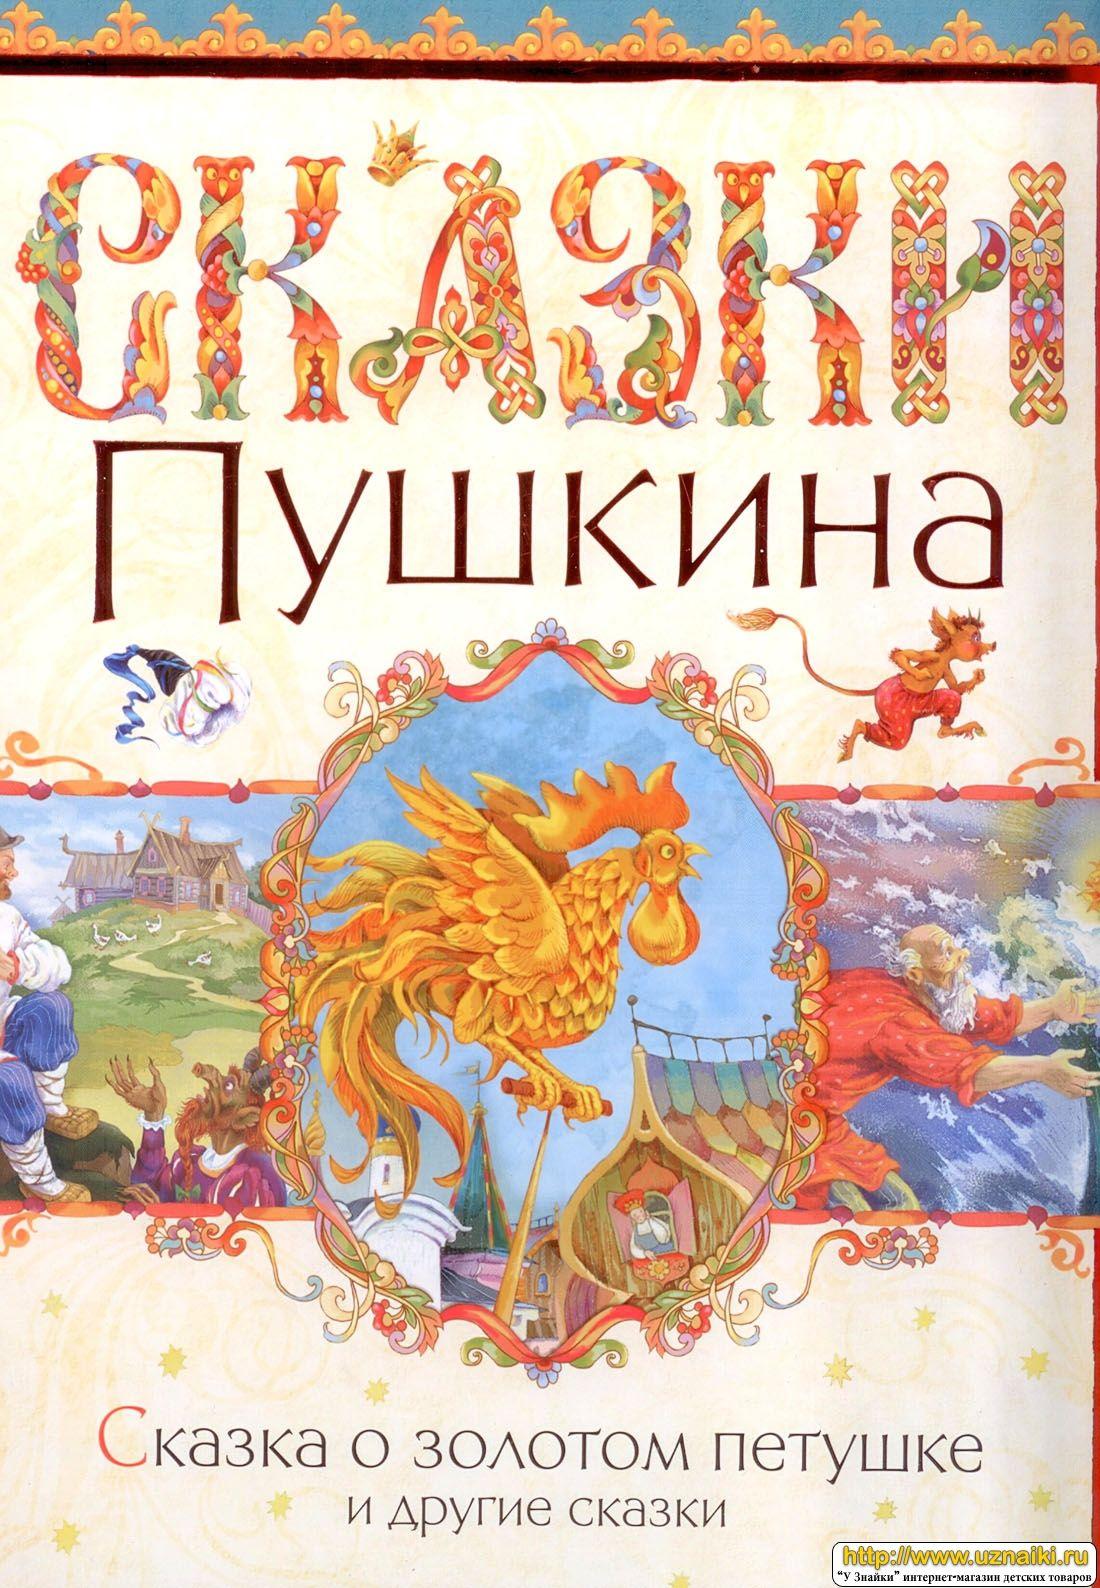 сказки пушкина для детей картинки